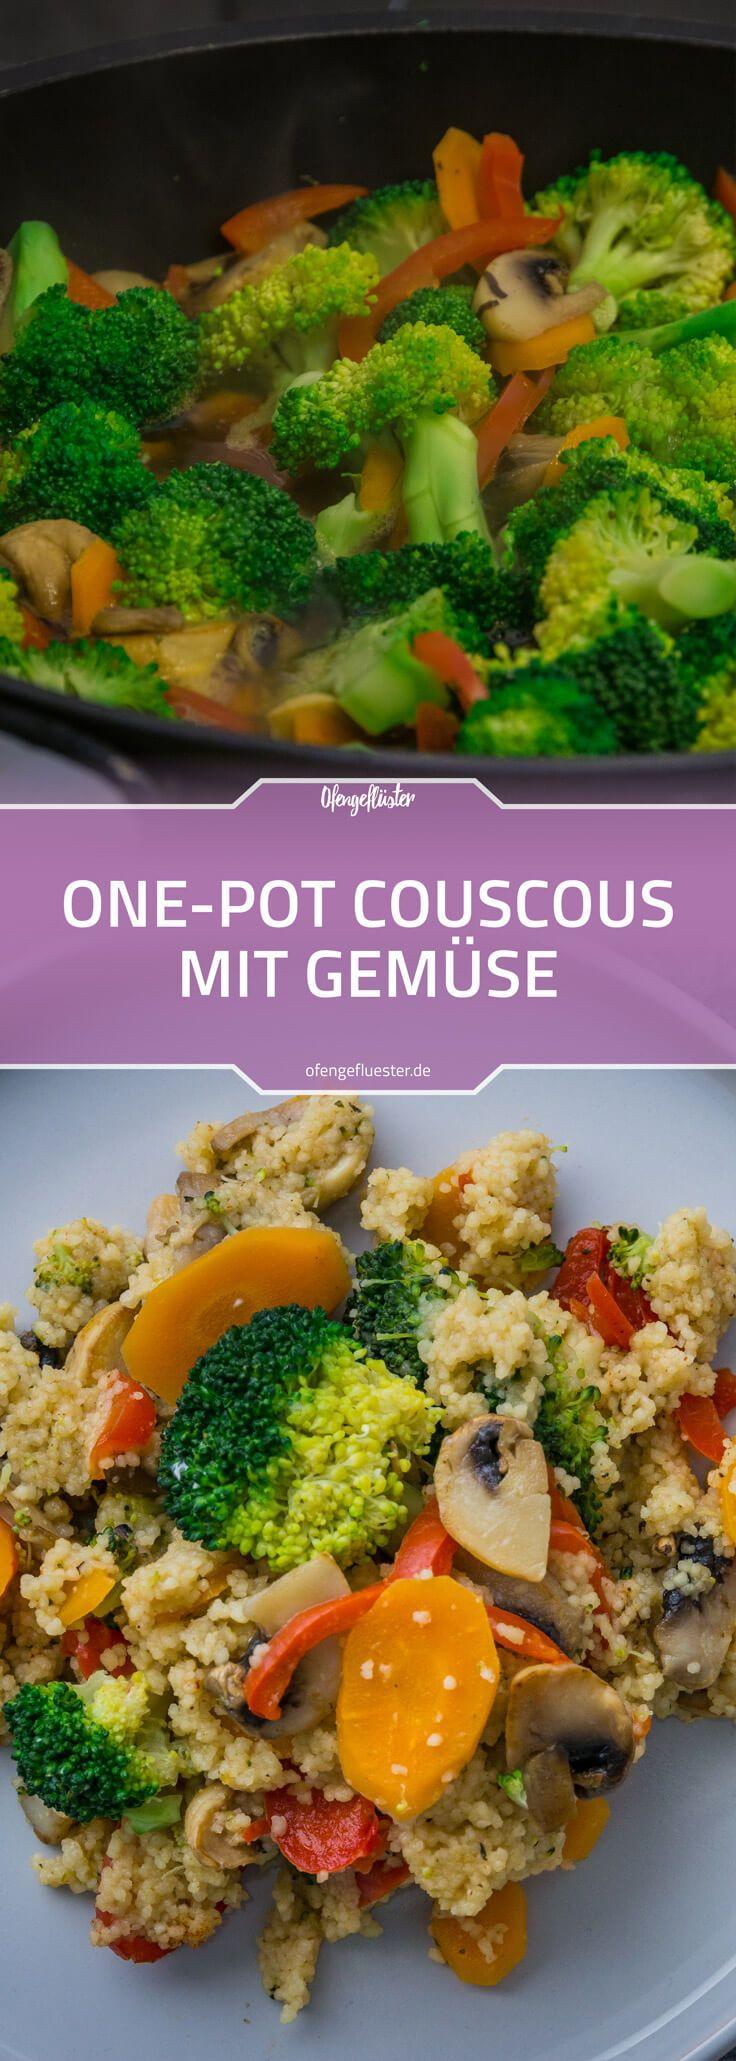 One-Pot-Couscous mit Gemüse #vejetaryentarifleri